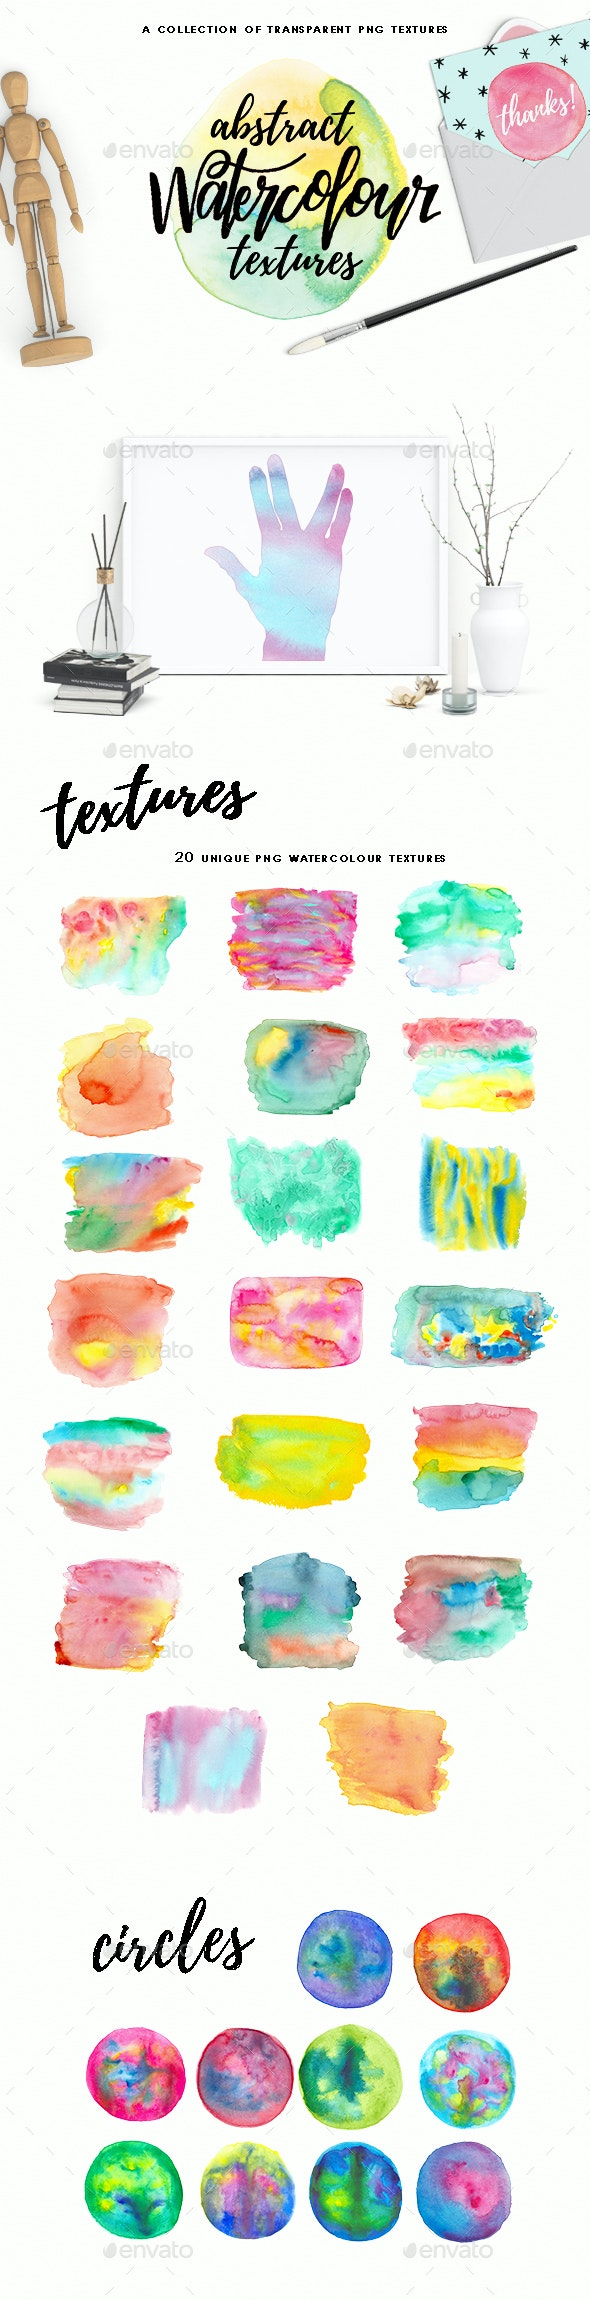 Abstract Watercolour Textures - Textures